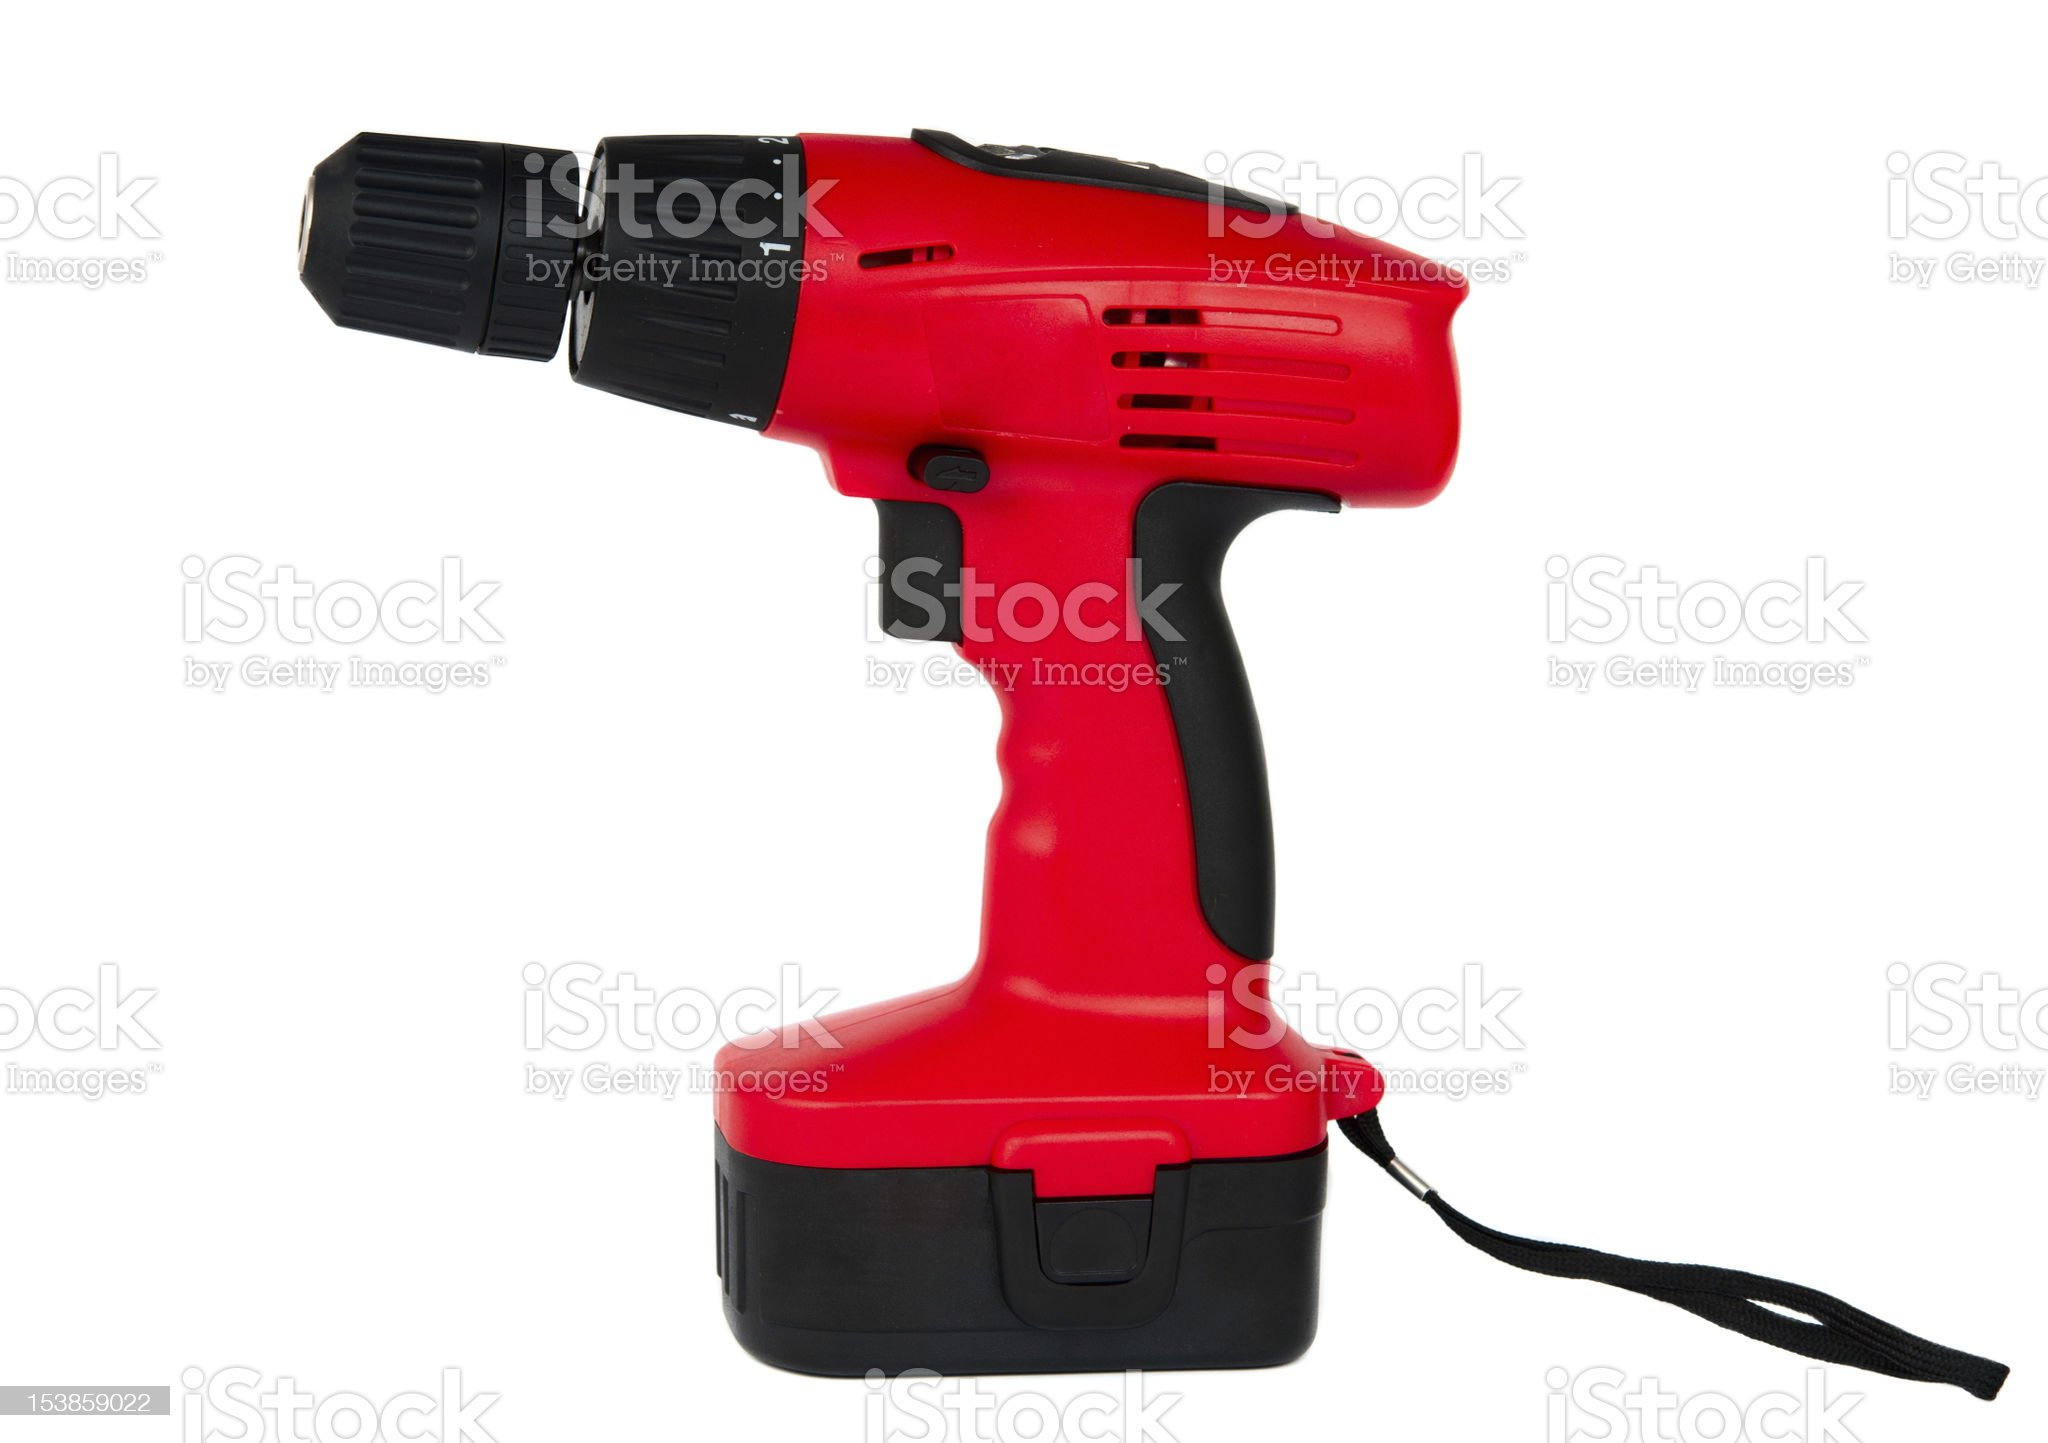 Cordless screwdriver royalty-free stock photo